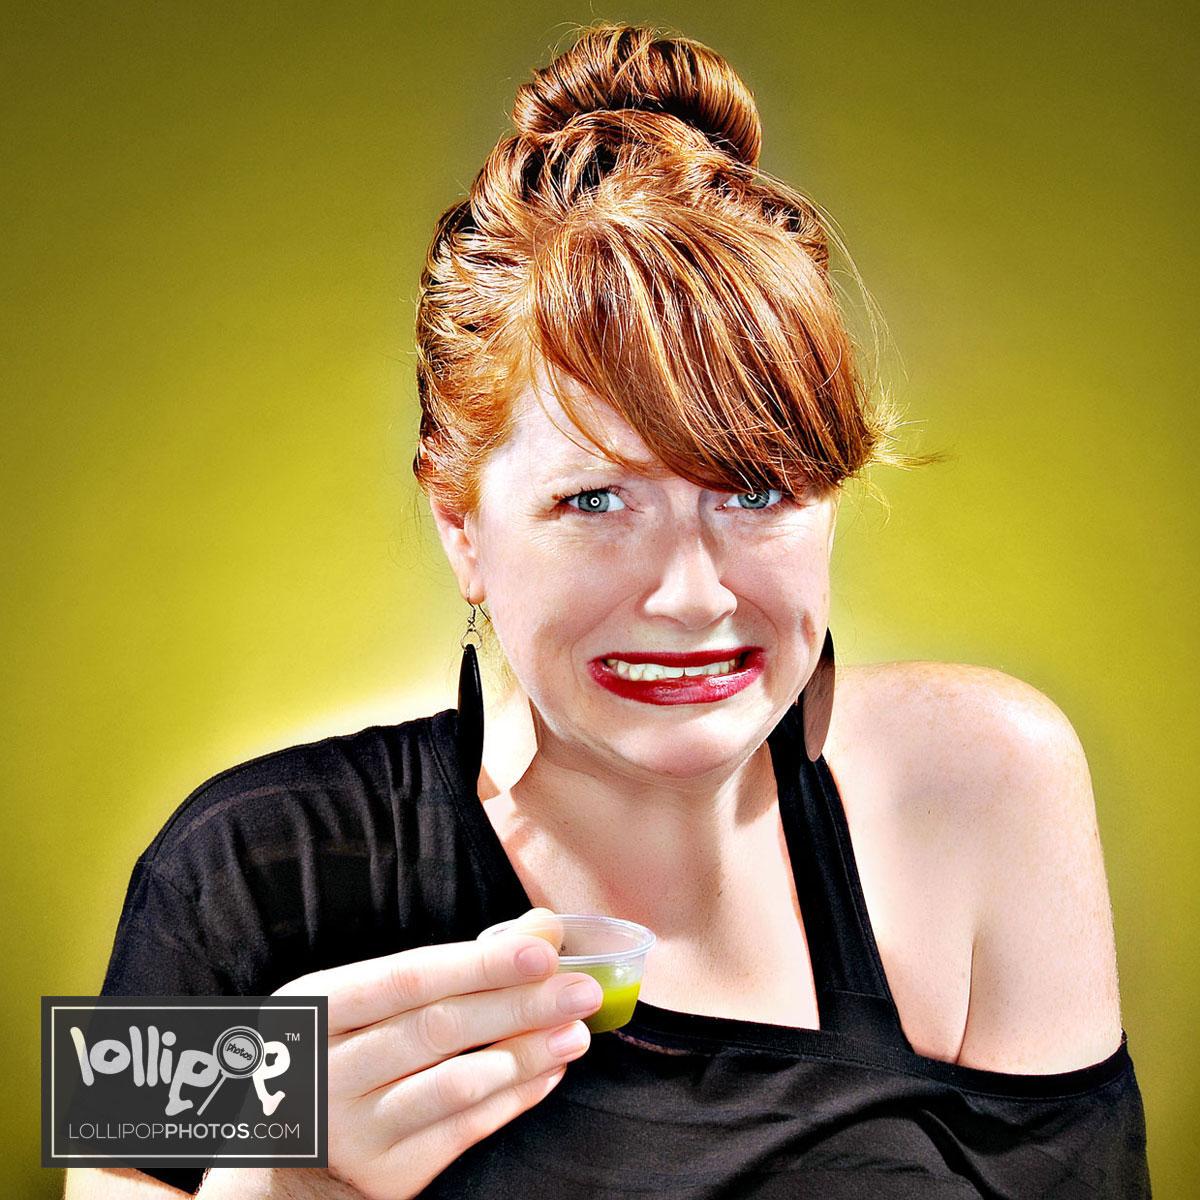 msdig-nora-canfield-lollipop-photos-552.jpg